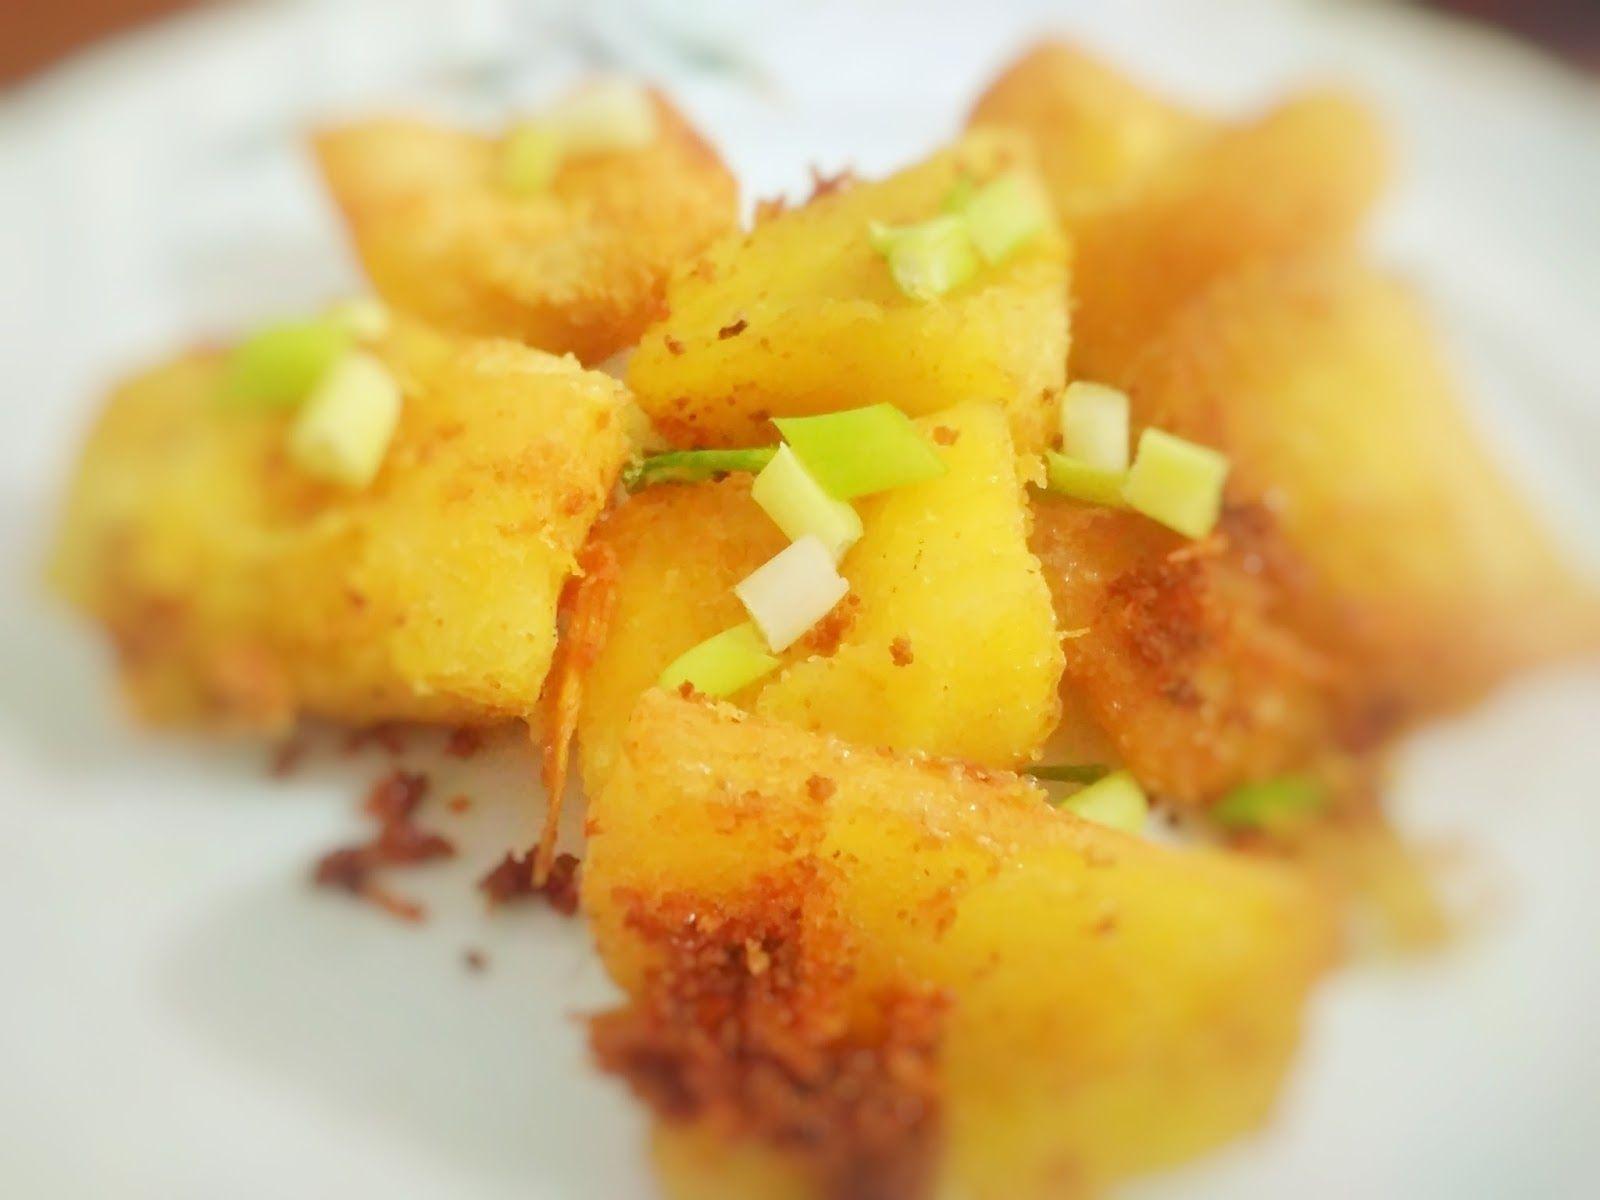 Resep Masak Singkong Goreng Bumbu Kuning Resep Segala Masakan Web Id Resep Resep Makanan Resep Masakan